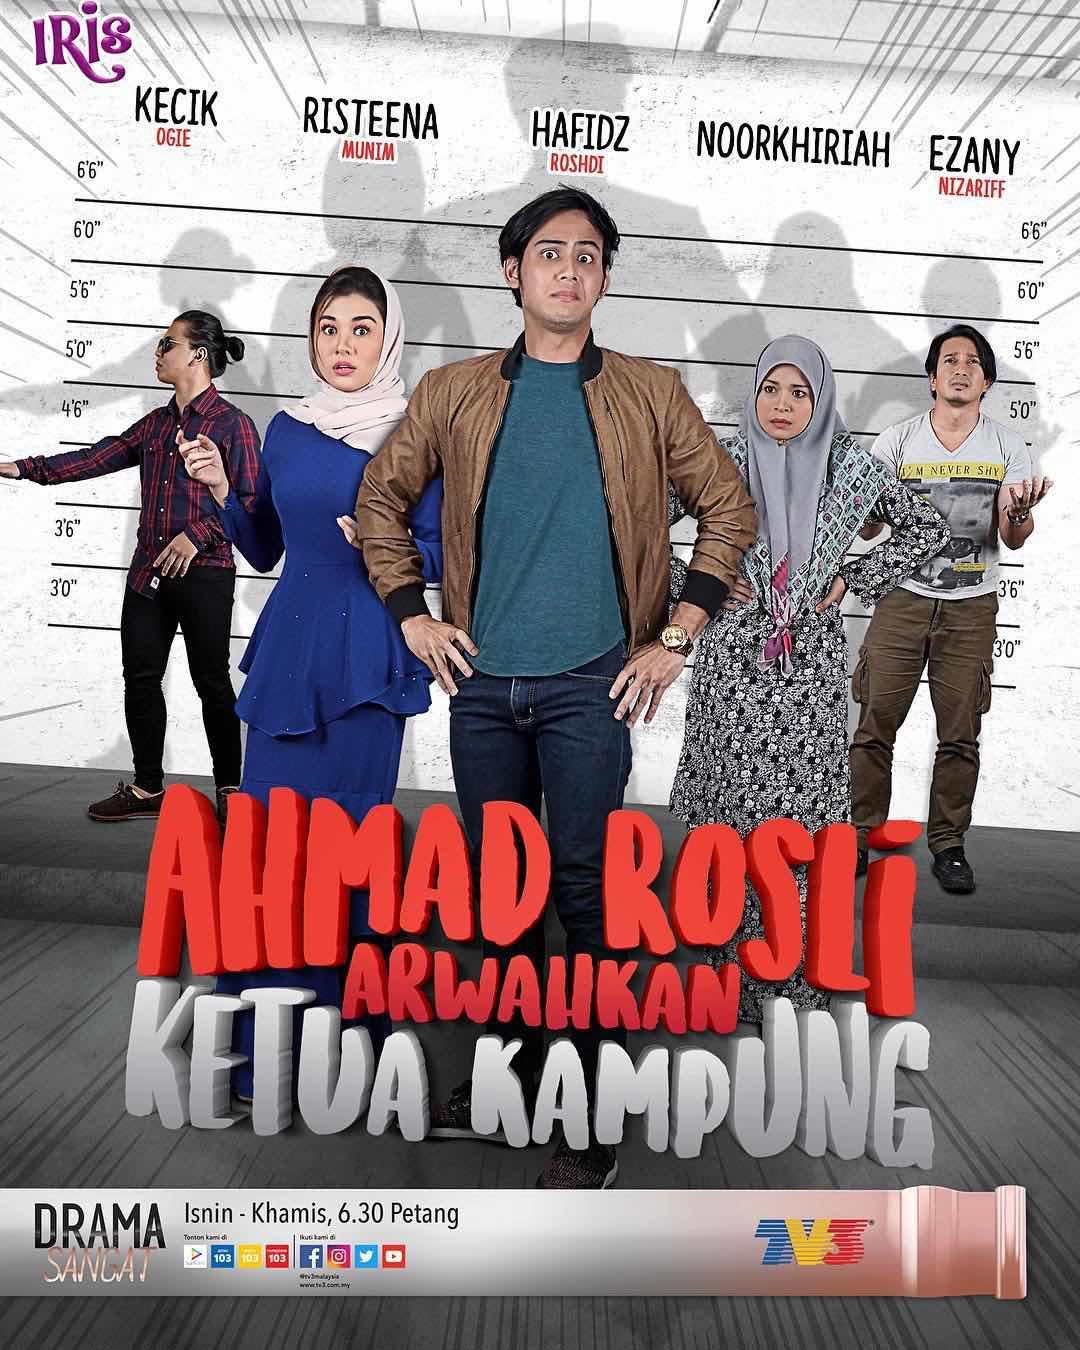 Permalink to Sinopsis Drama Ahmad Rosli Arwahkan Ketua Kampung (Iris TV3)